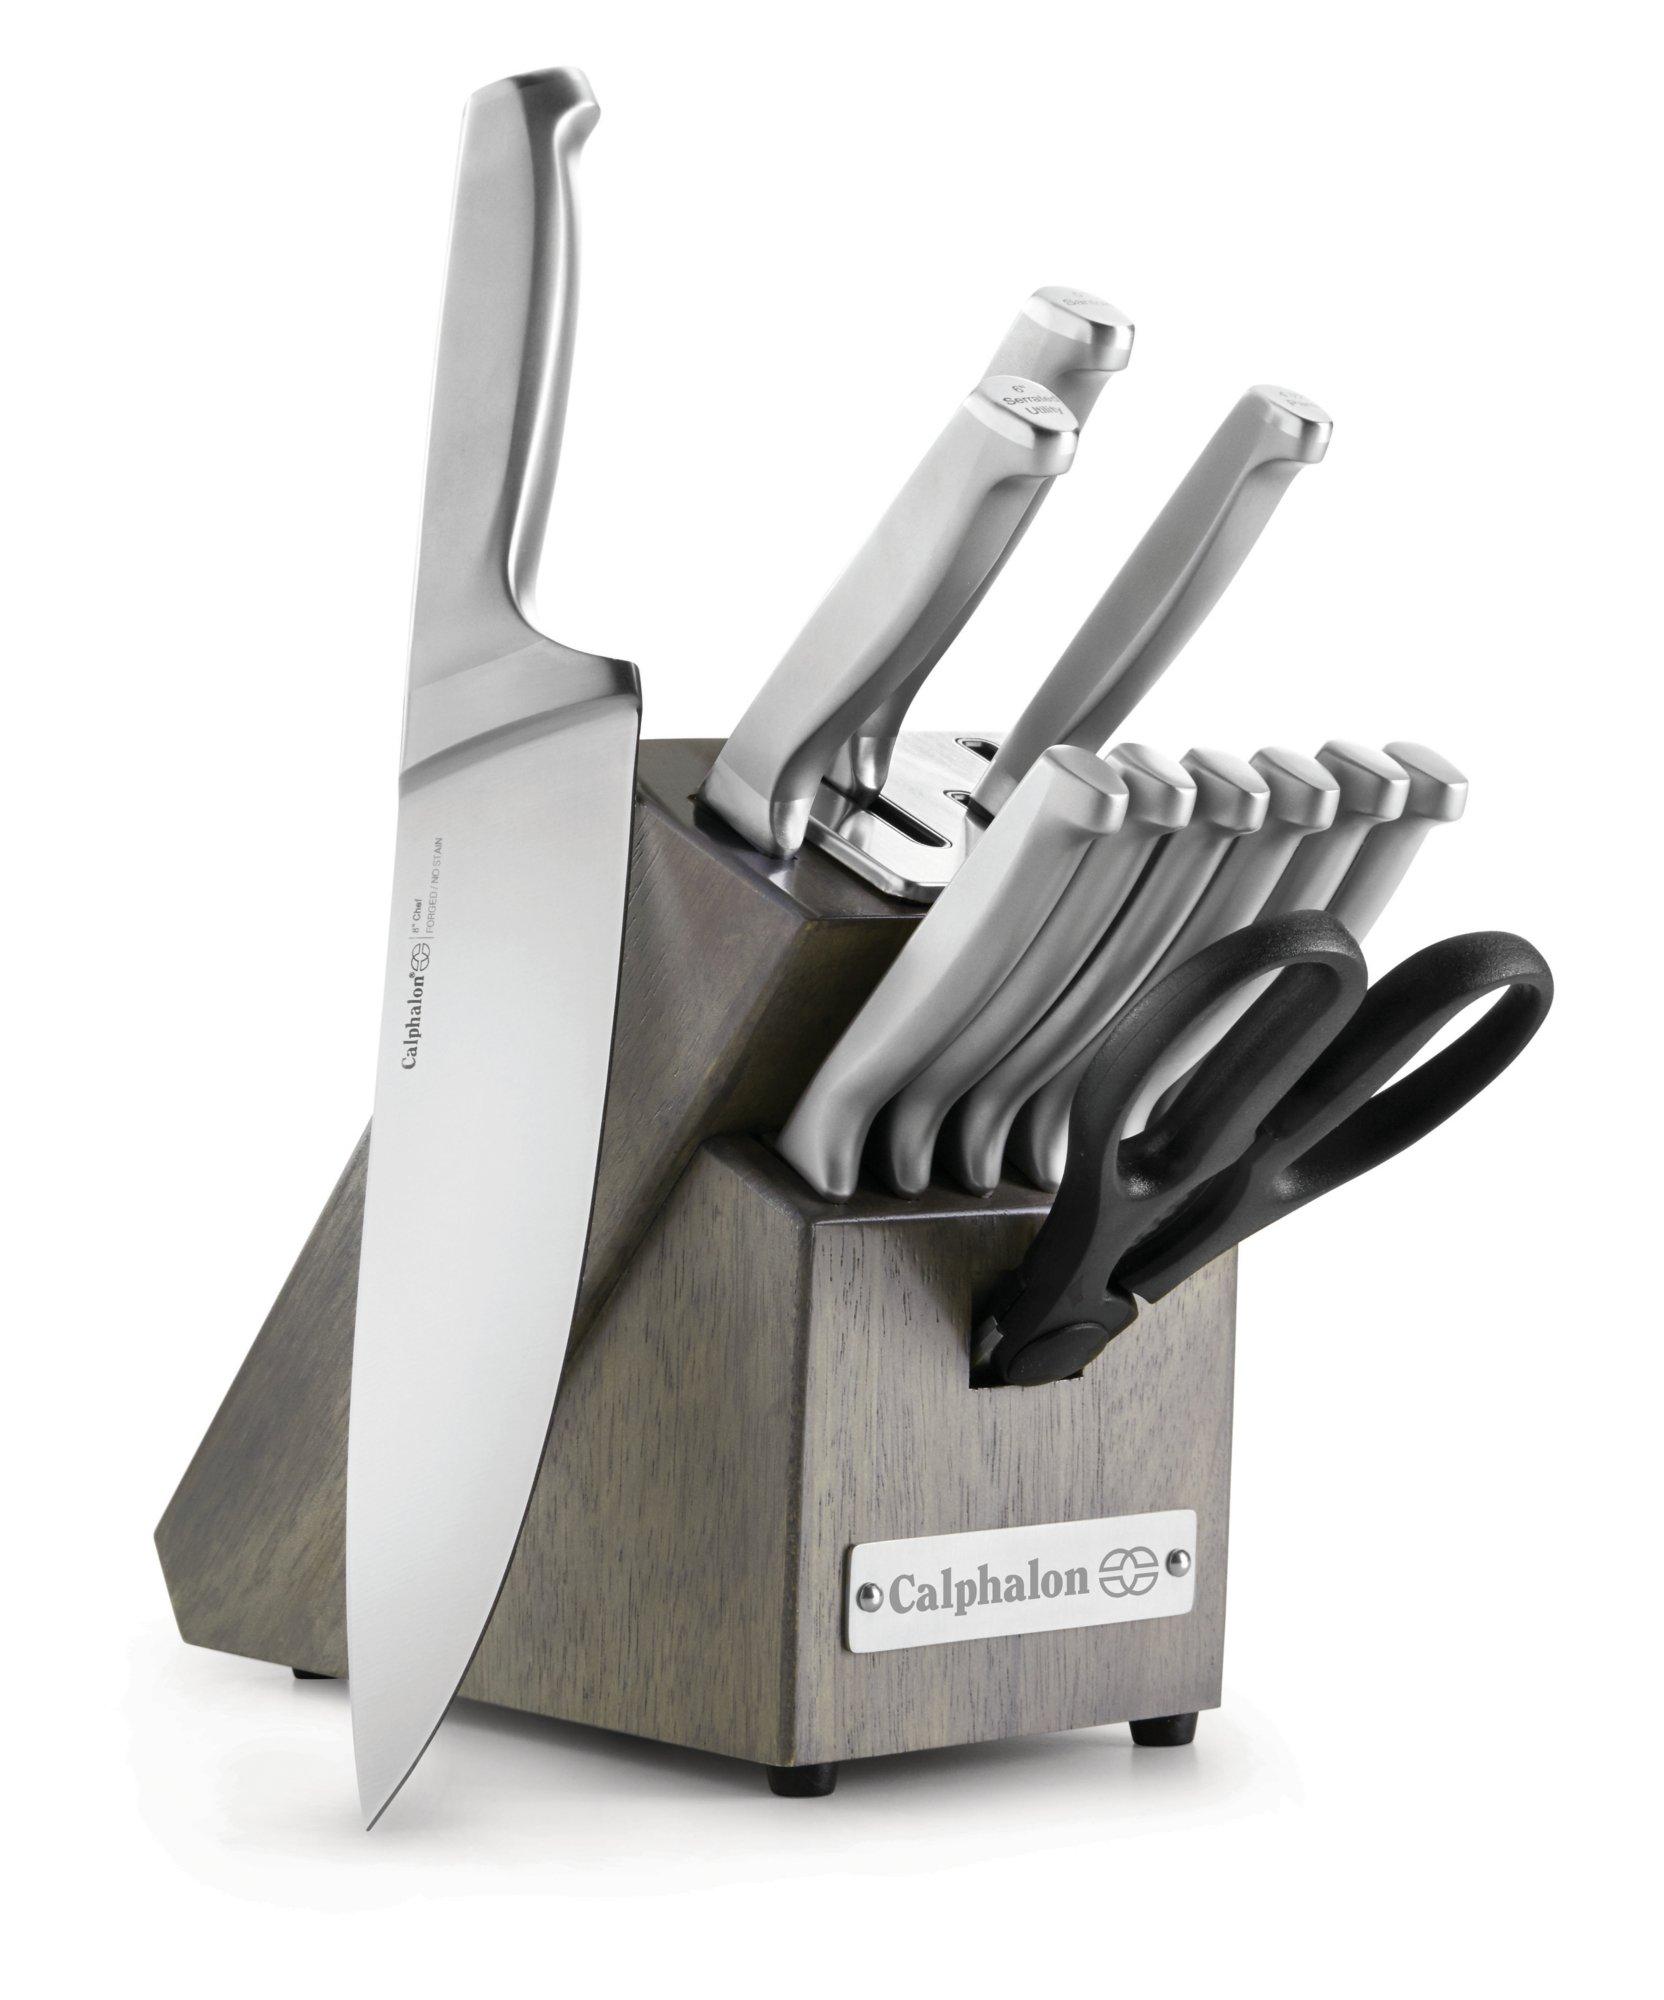 self sharpening kitchen knives homedepot cabinets knife sets calphalonusastore